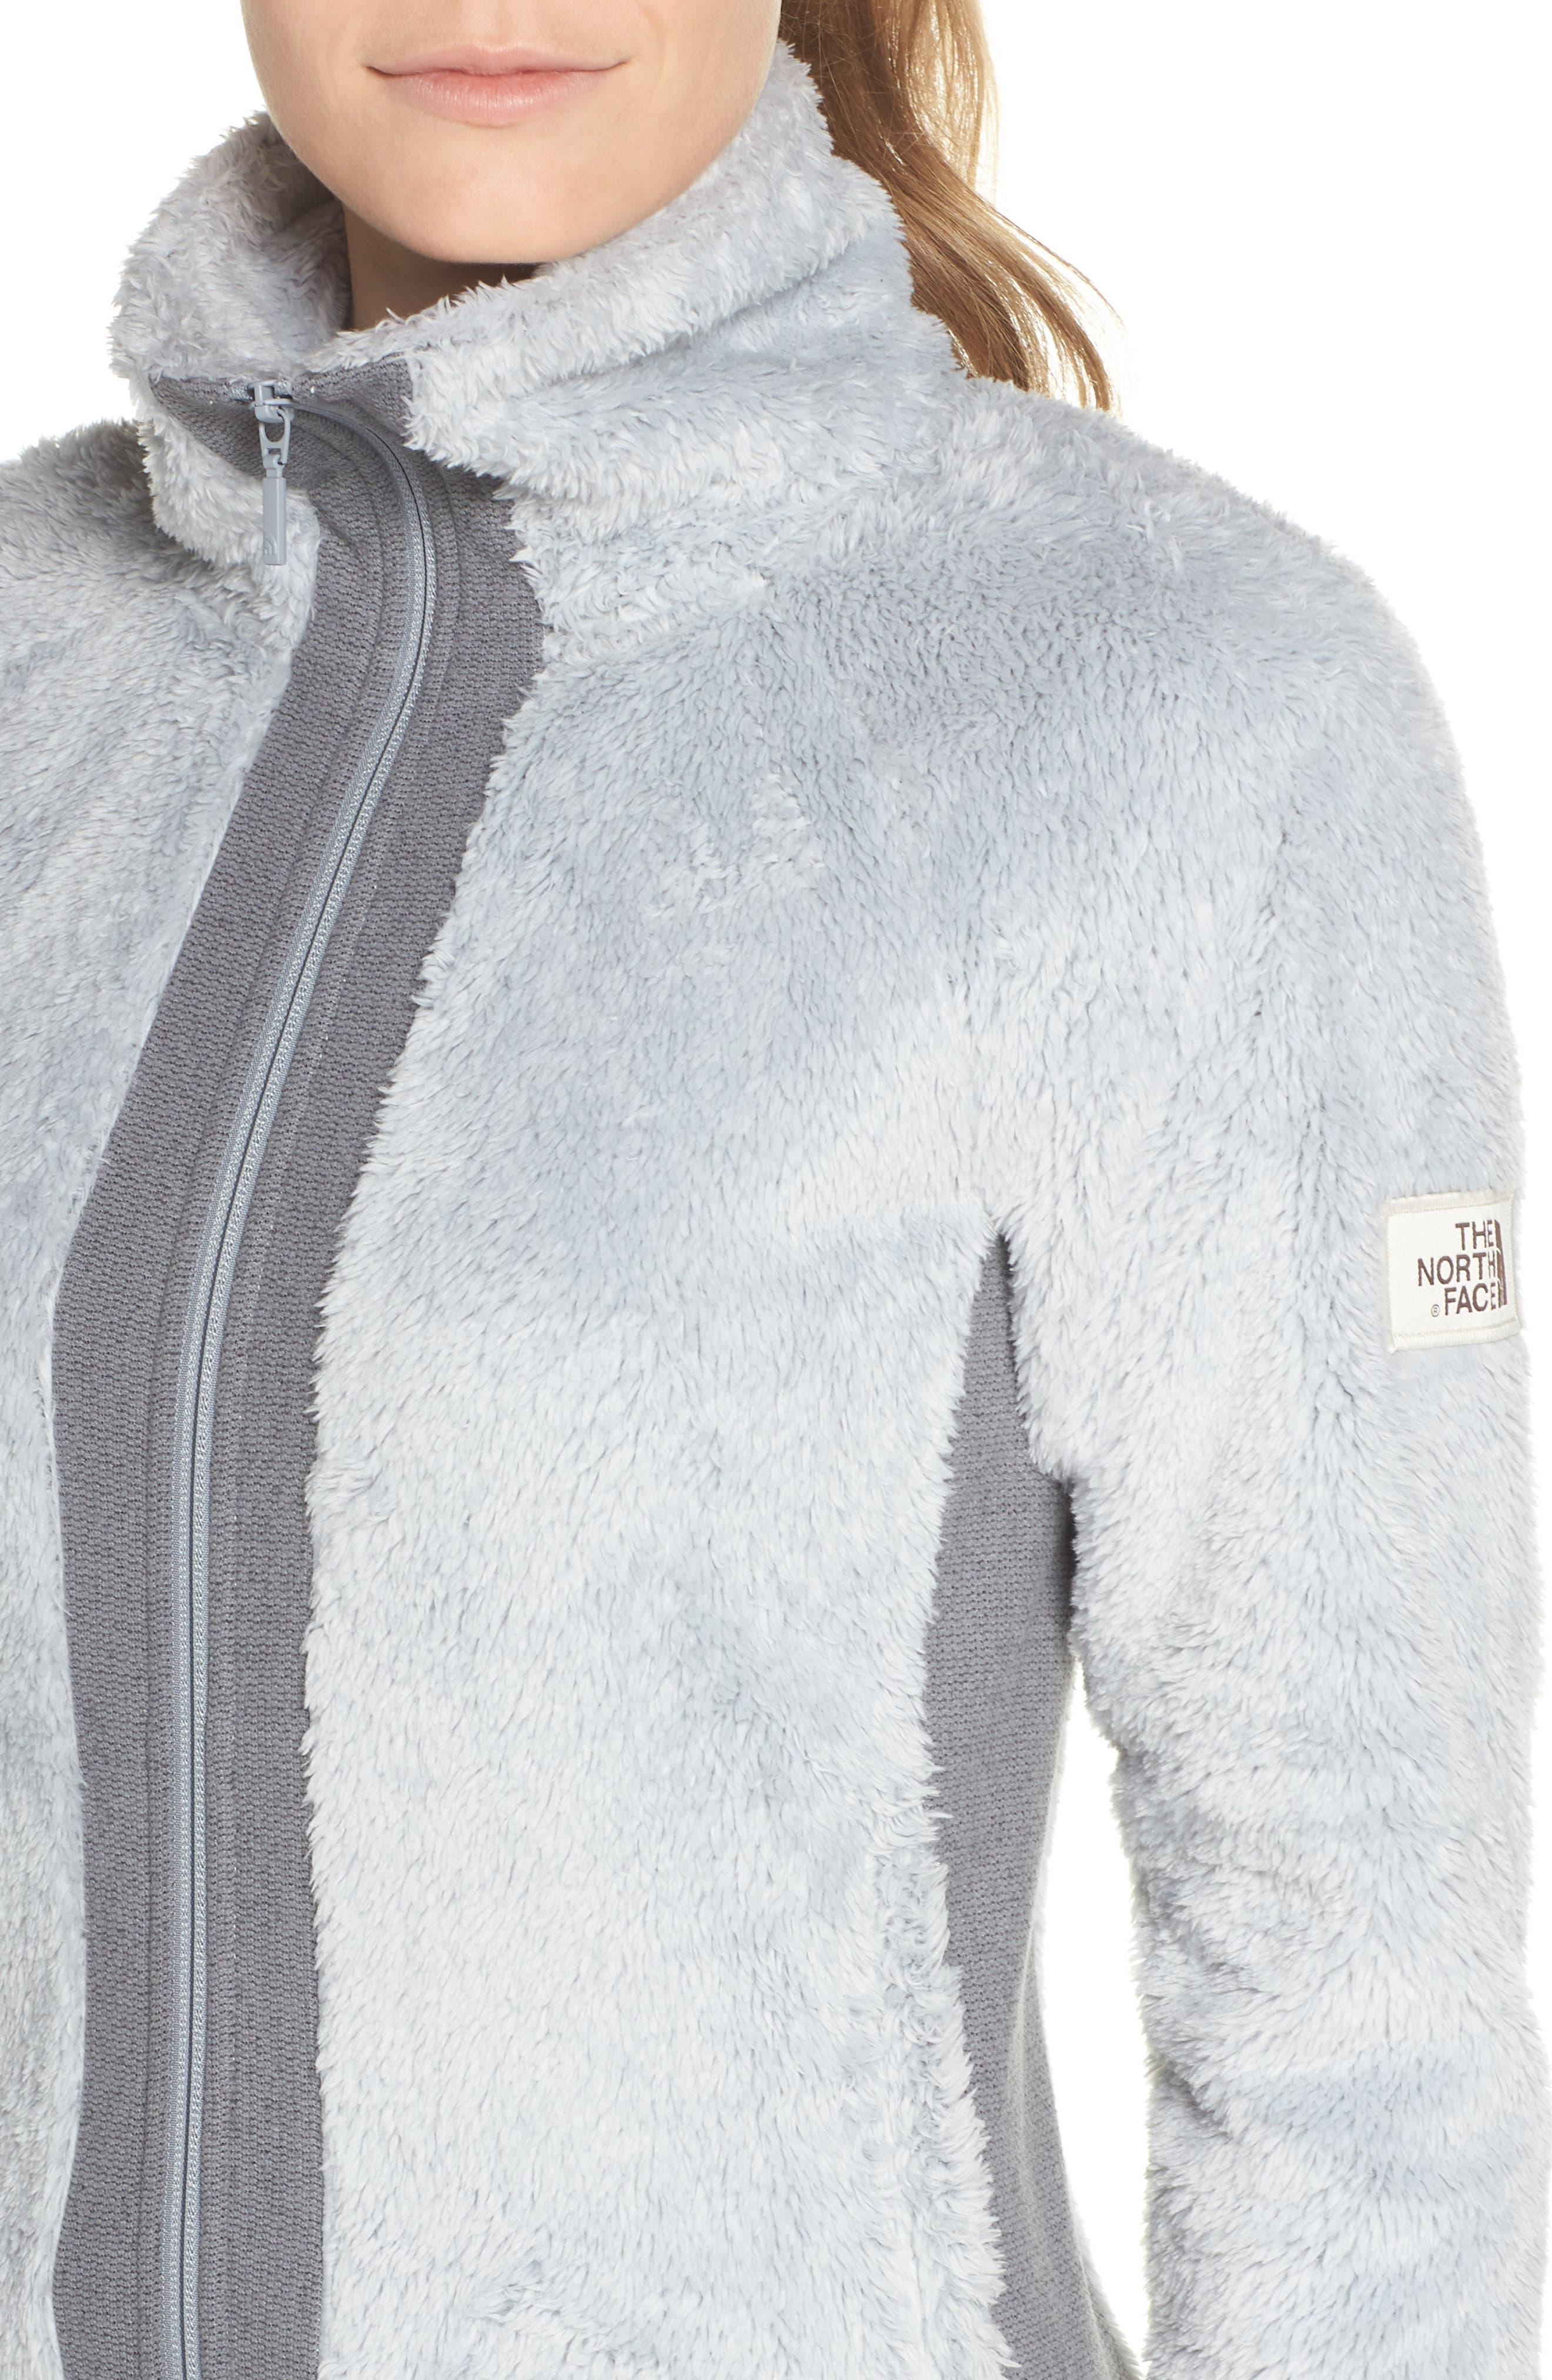 Furry Fleece Jacket,                             Alternate thumbnail 4, color,                             High Rise Grey